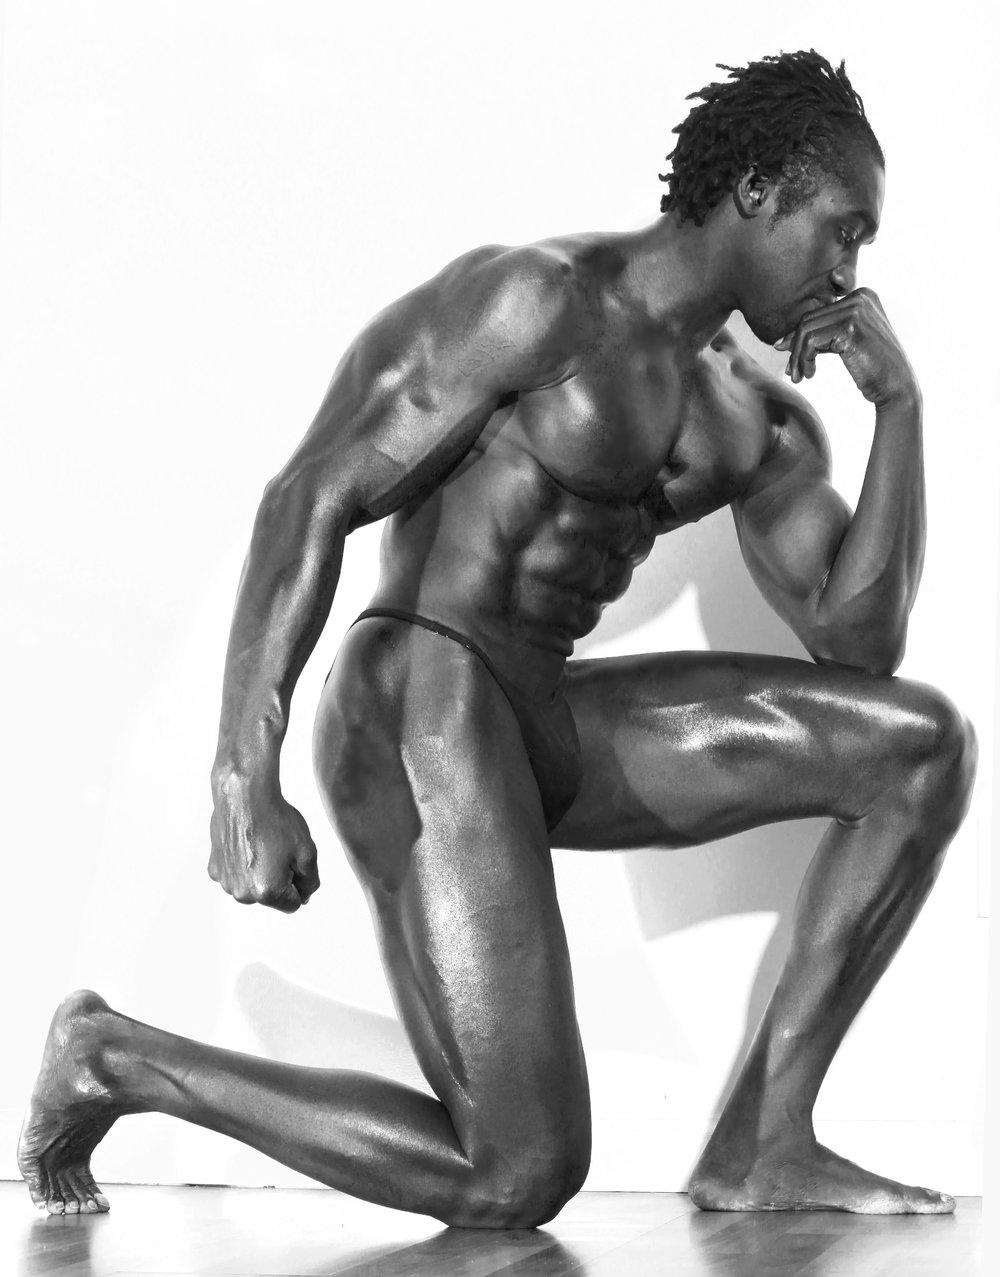 vicky-good-fitness-photography-bodybuilder